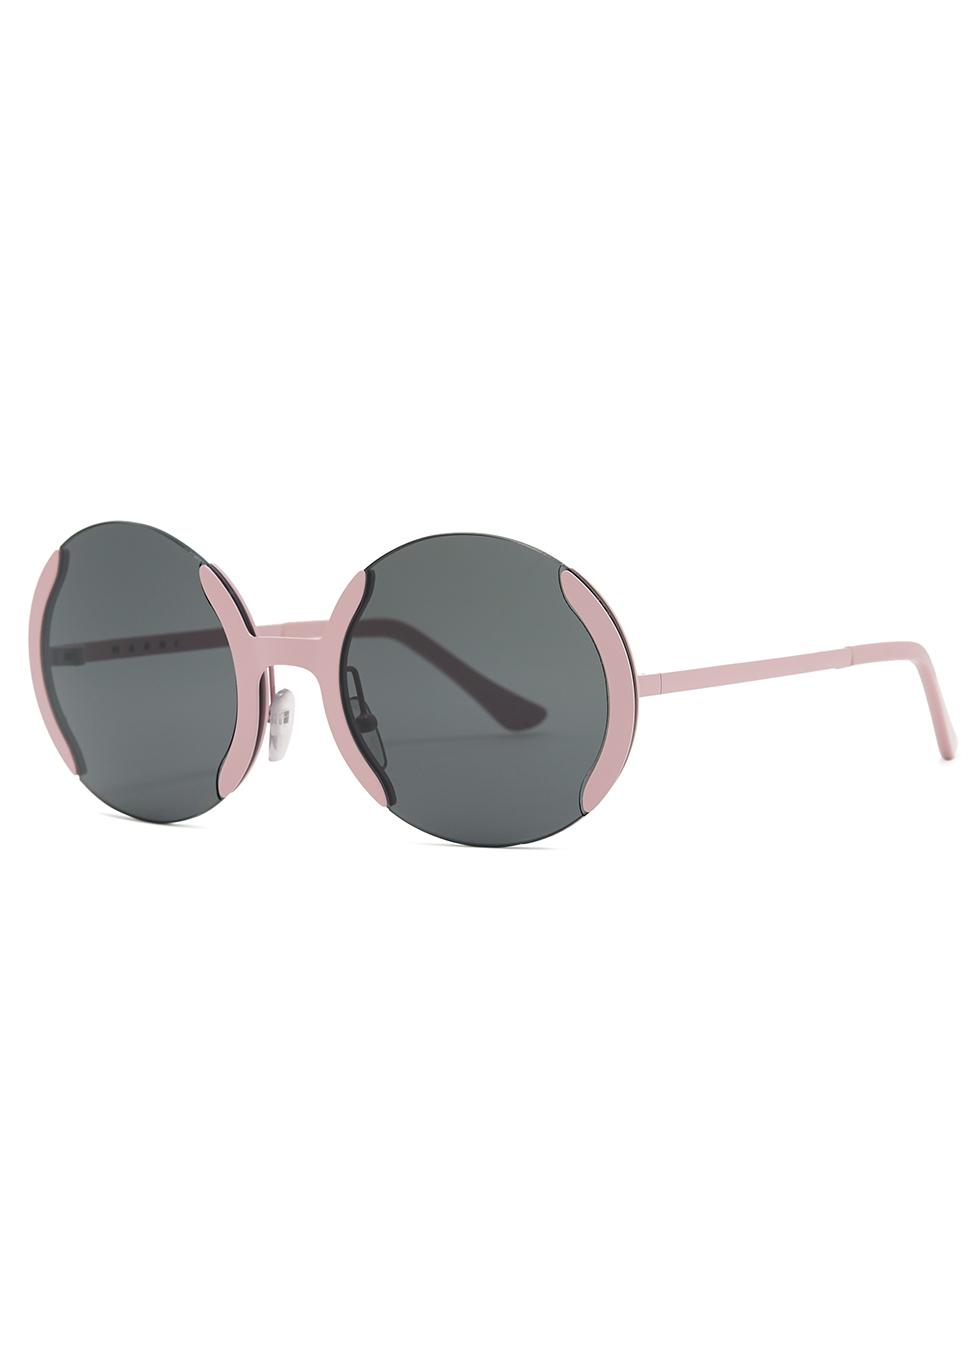 Full Moon pink round-frame sunglasses - Marni